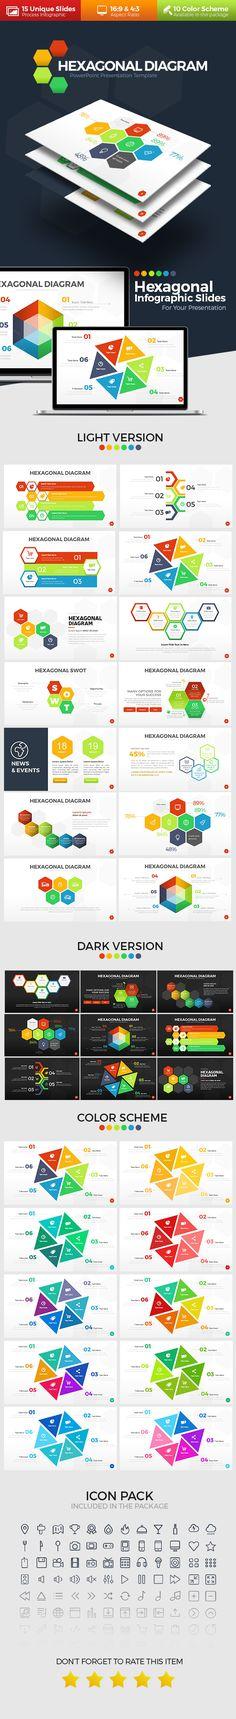 Hexagonal Infographic #powerpoint #presentation Download : https://graphicriver.net/item/hexagonal-infographic/17429049?s_rank=9?ref=BrandEarth